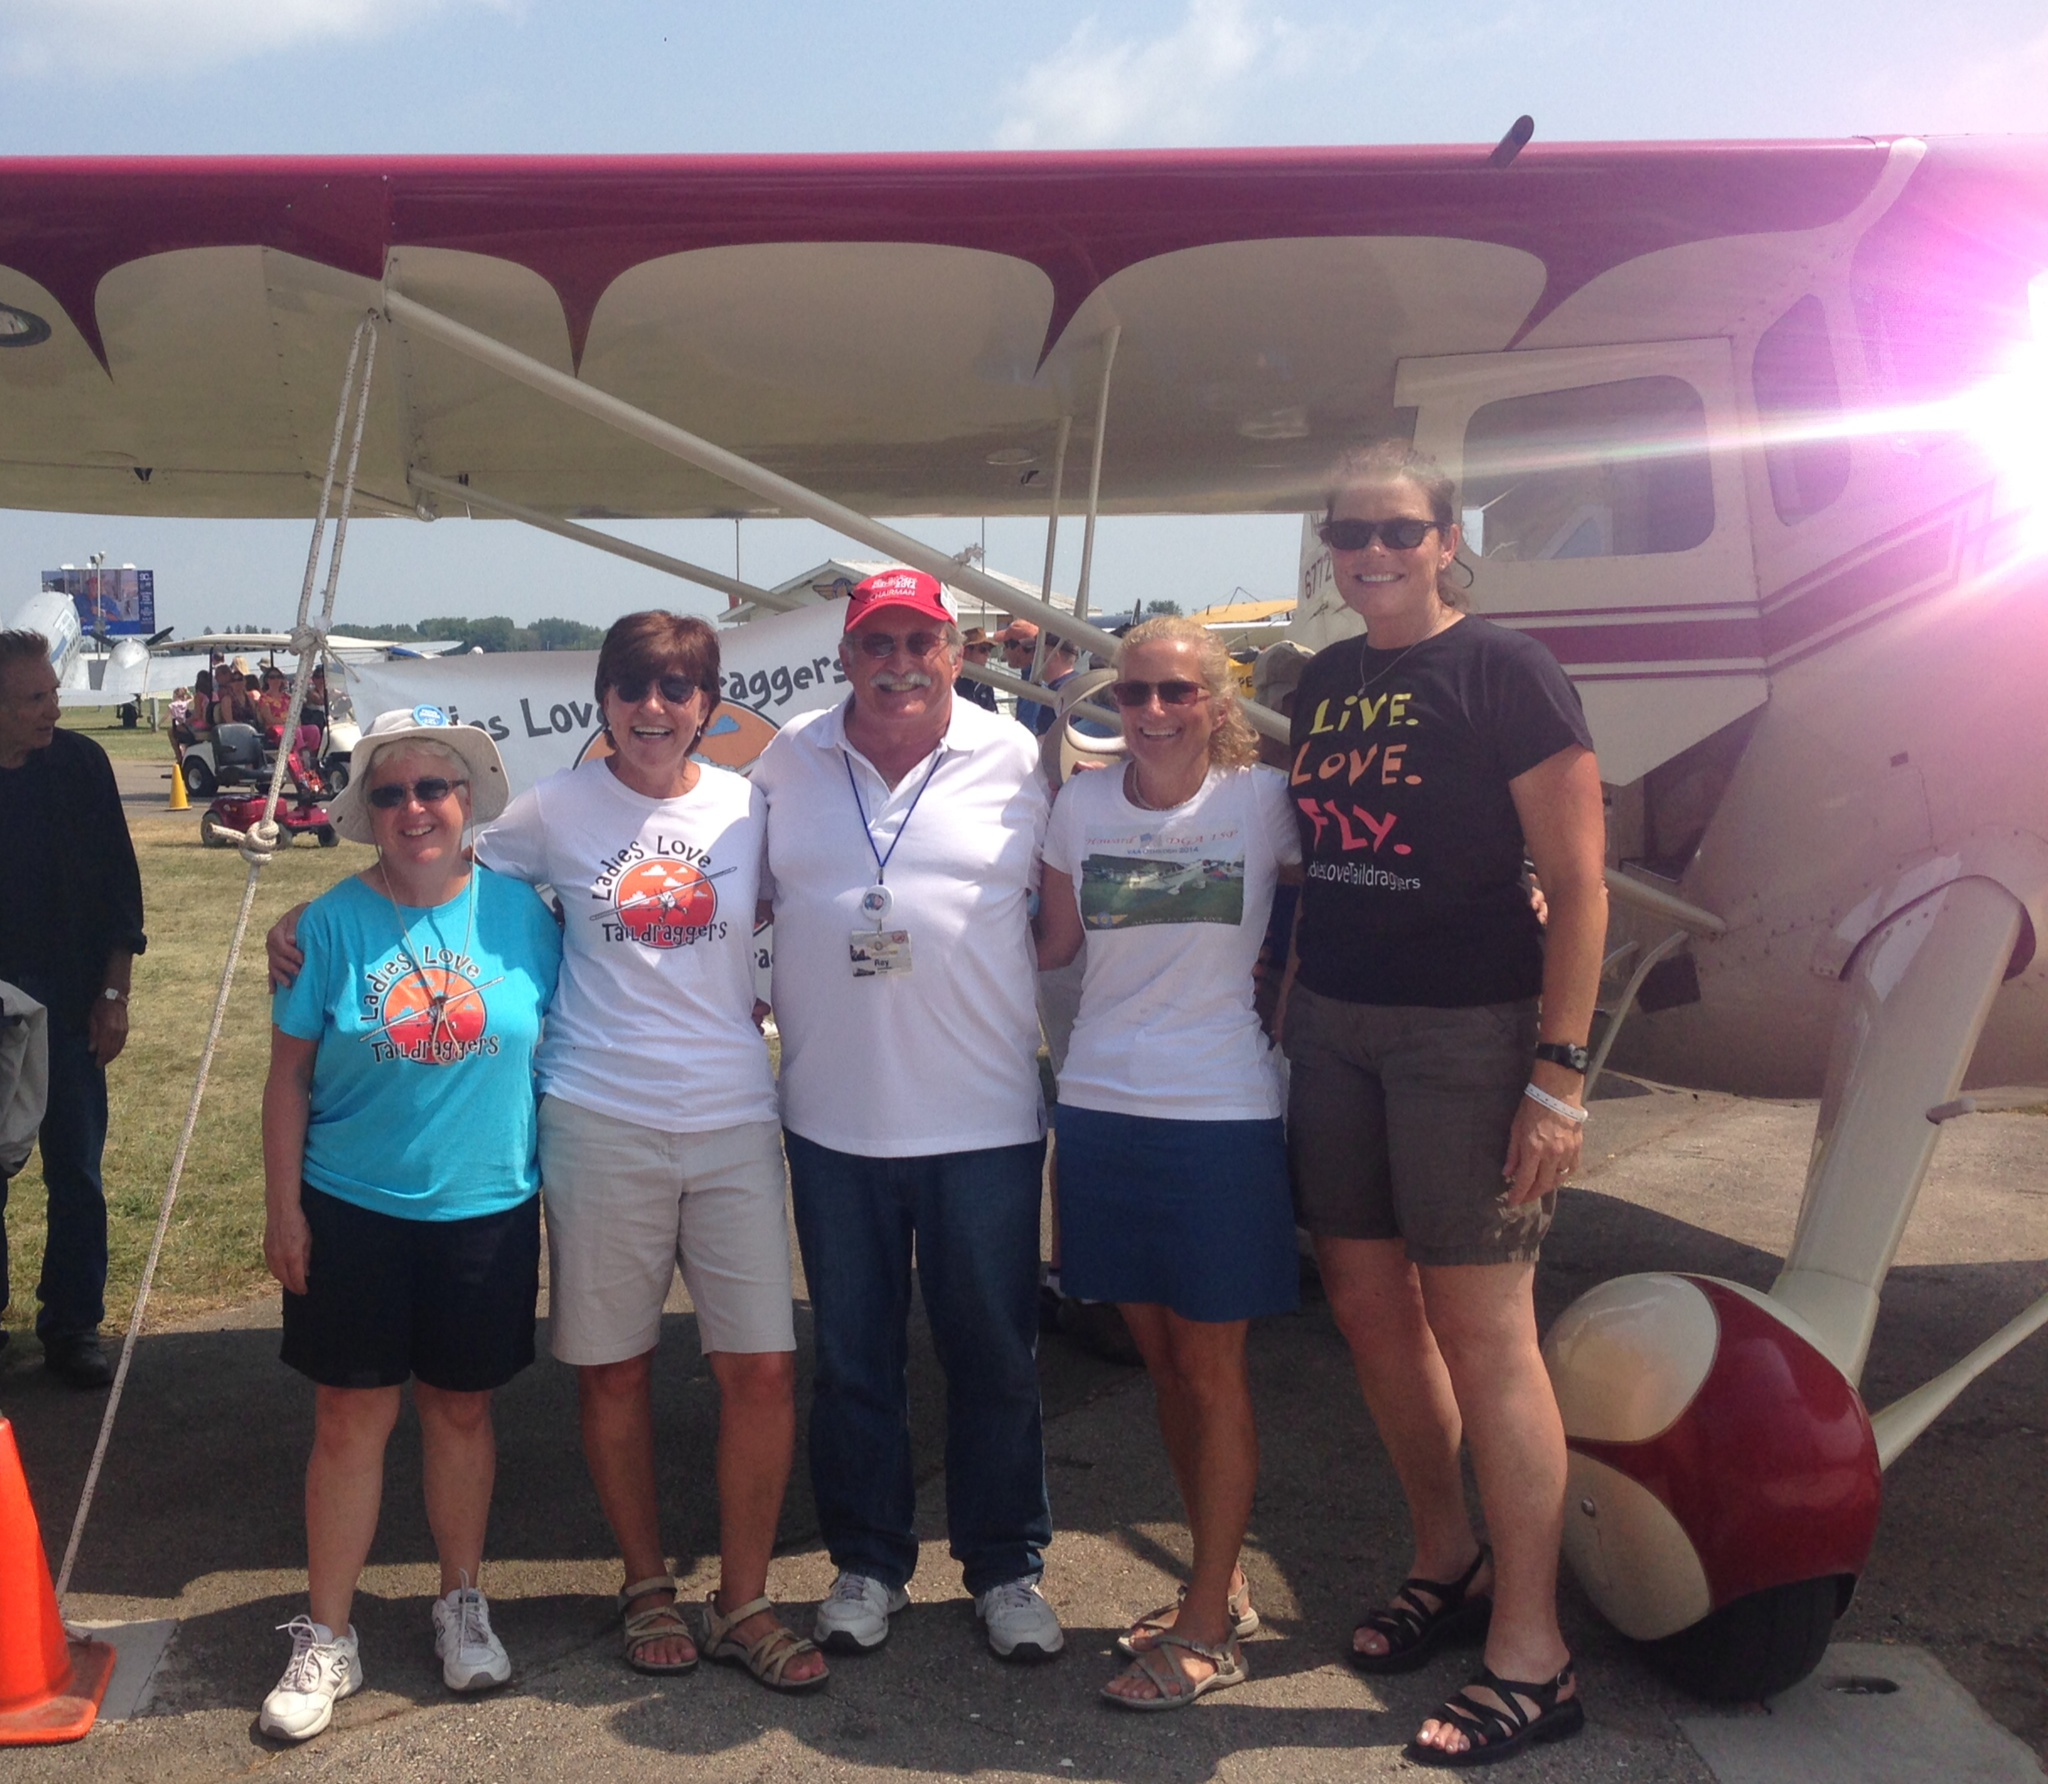 LadiesLoveTaildraggers at AirVenture 2015!